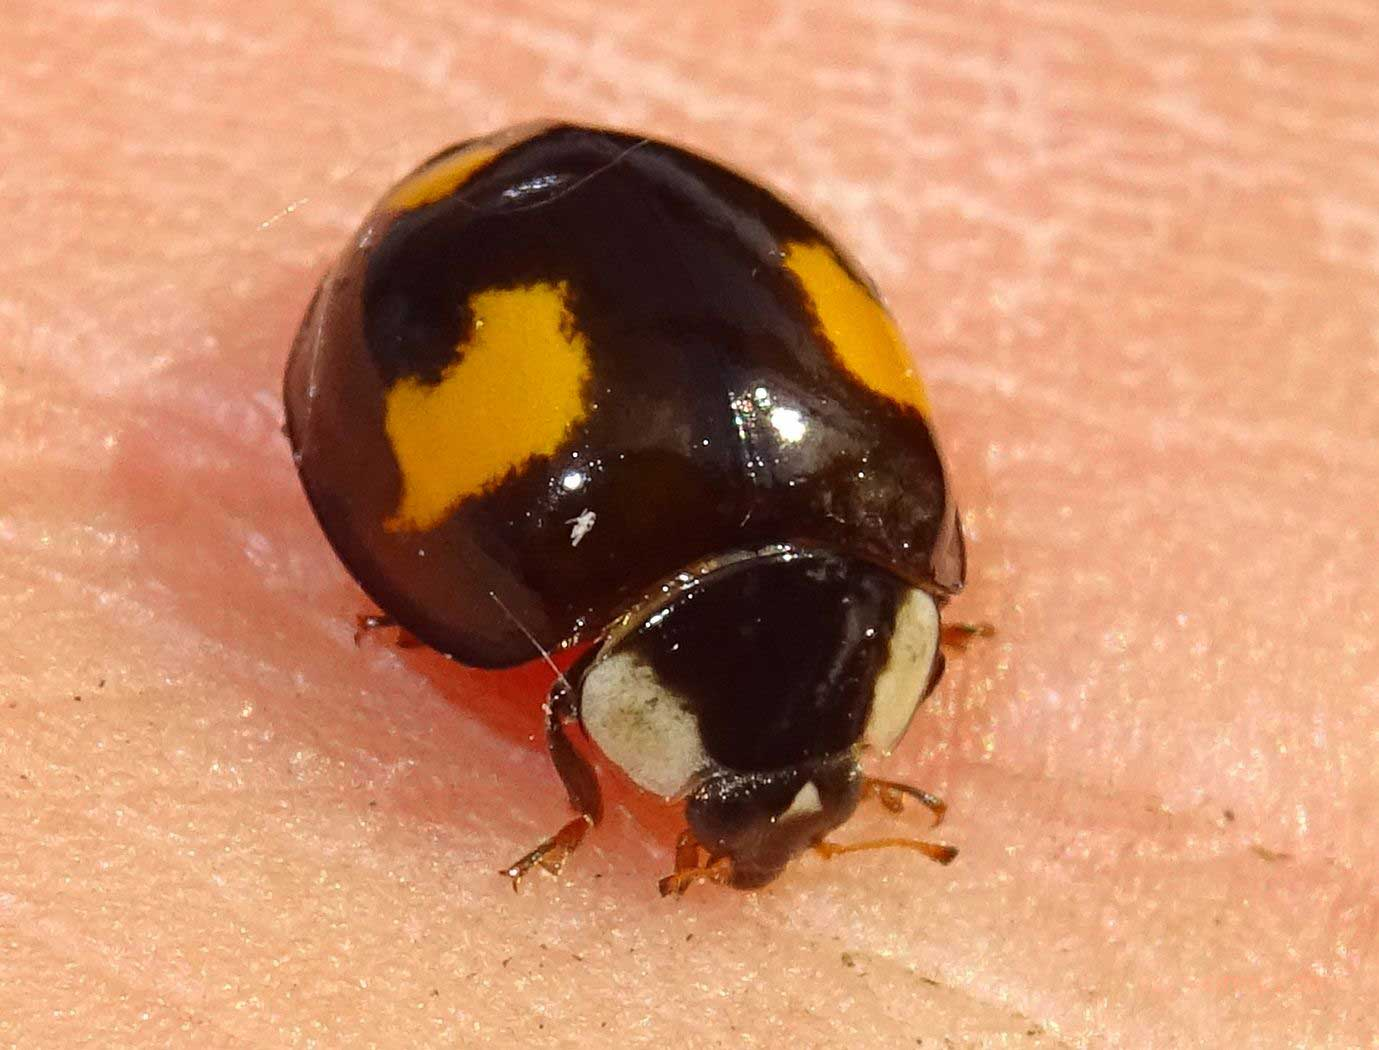 Harlekin-Marienkäfer (Insekten in Worms)